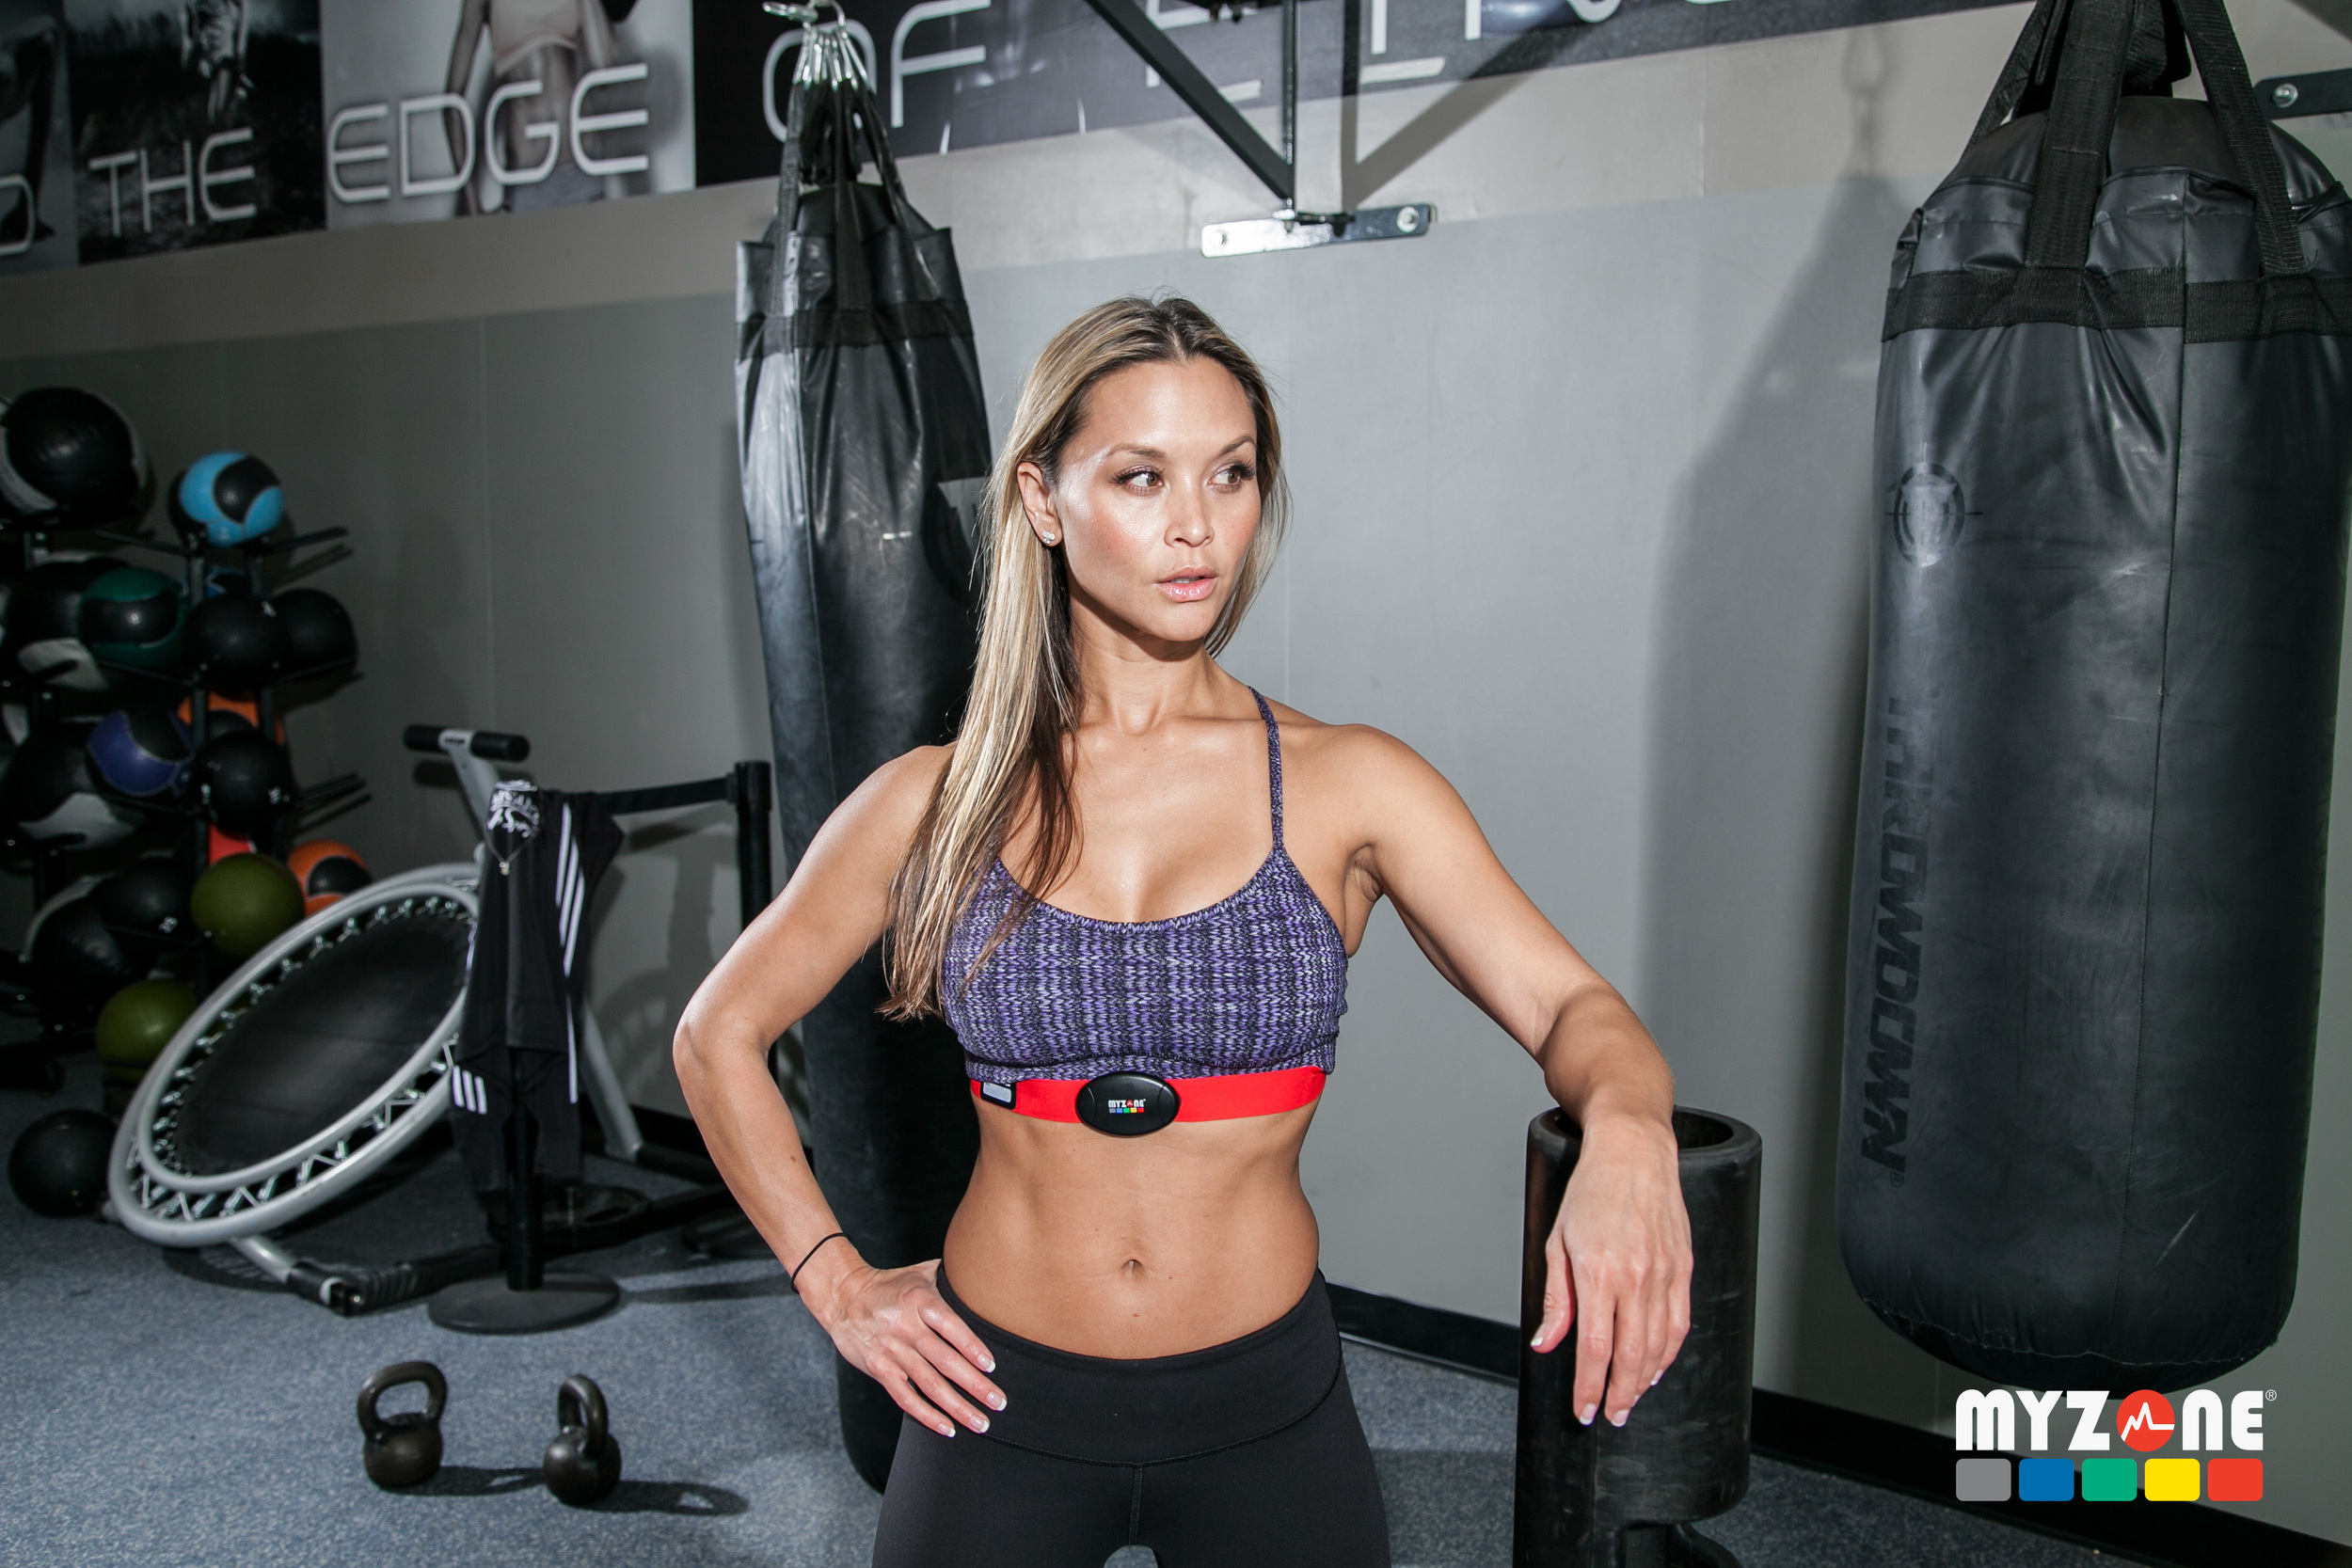 images---photos_boxinggirl4_3861x2574.jpg